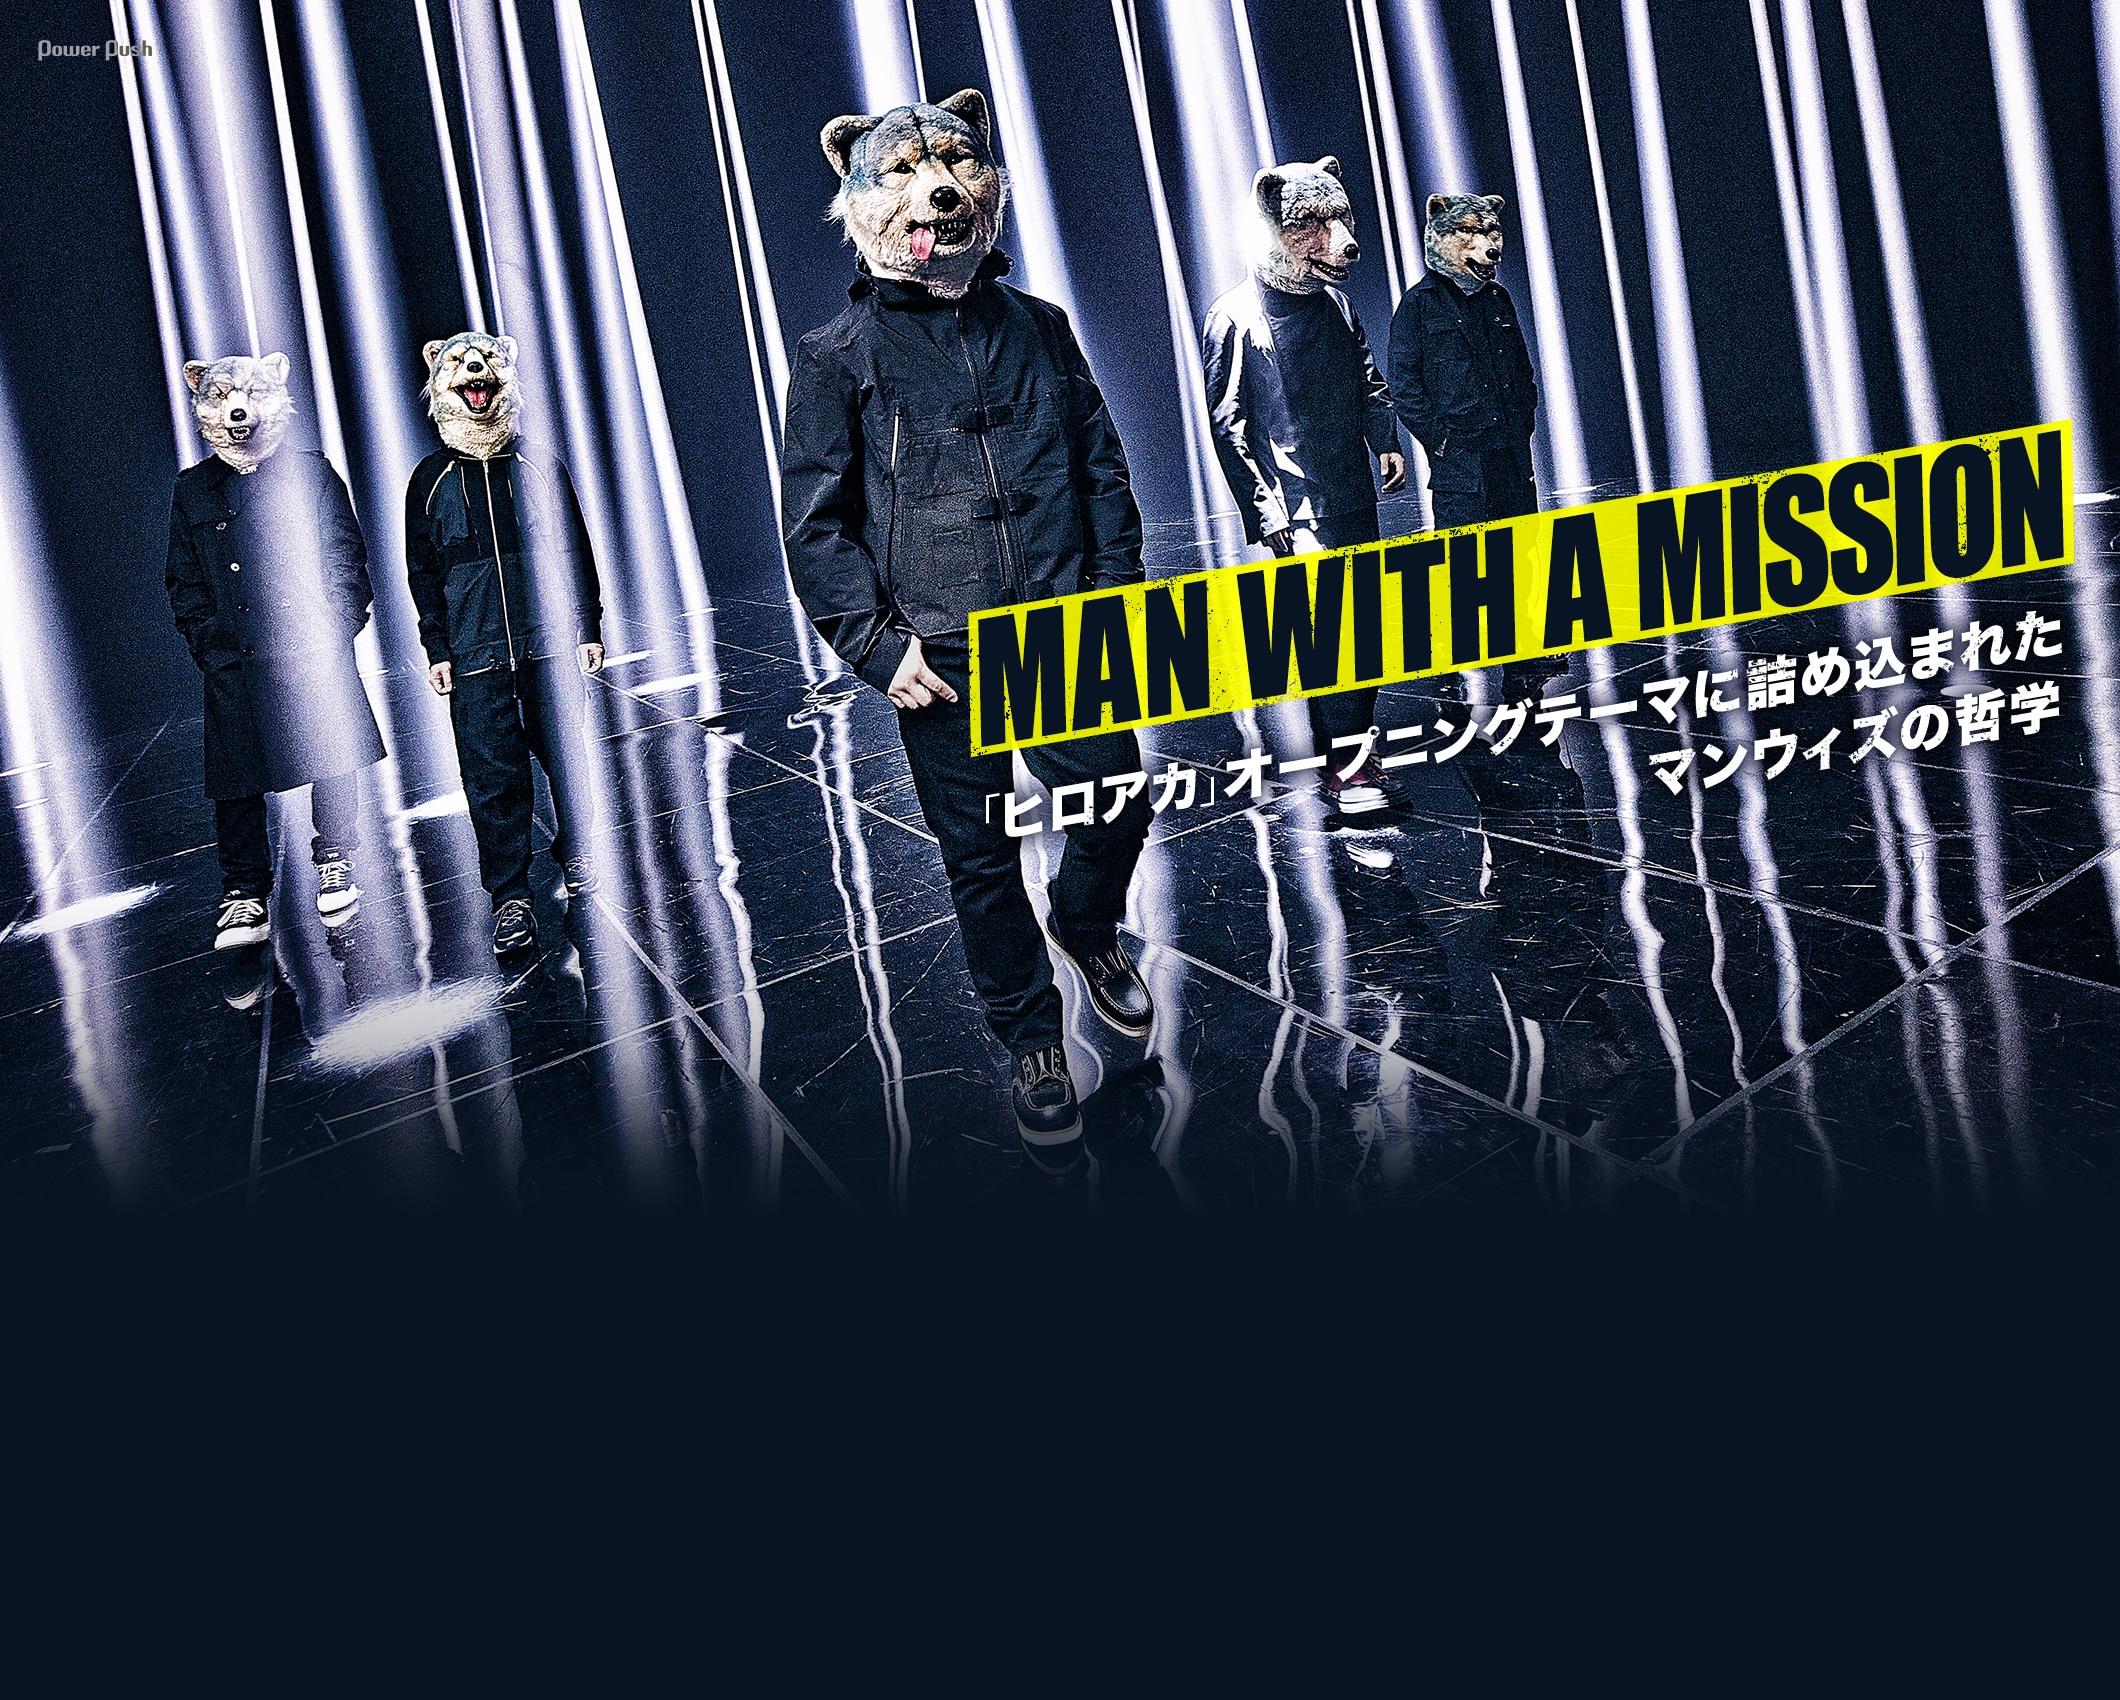 MAN WITH A MISSION|「ヒロアカ」オープニングテーマに詰め込まれたマンウィズの哲学